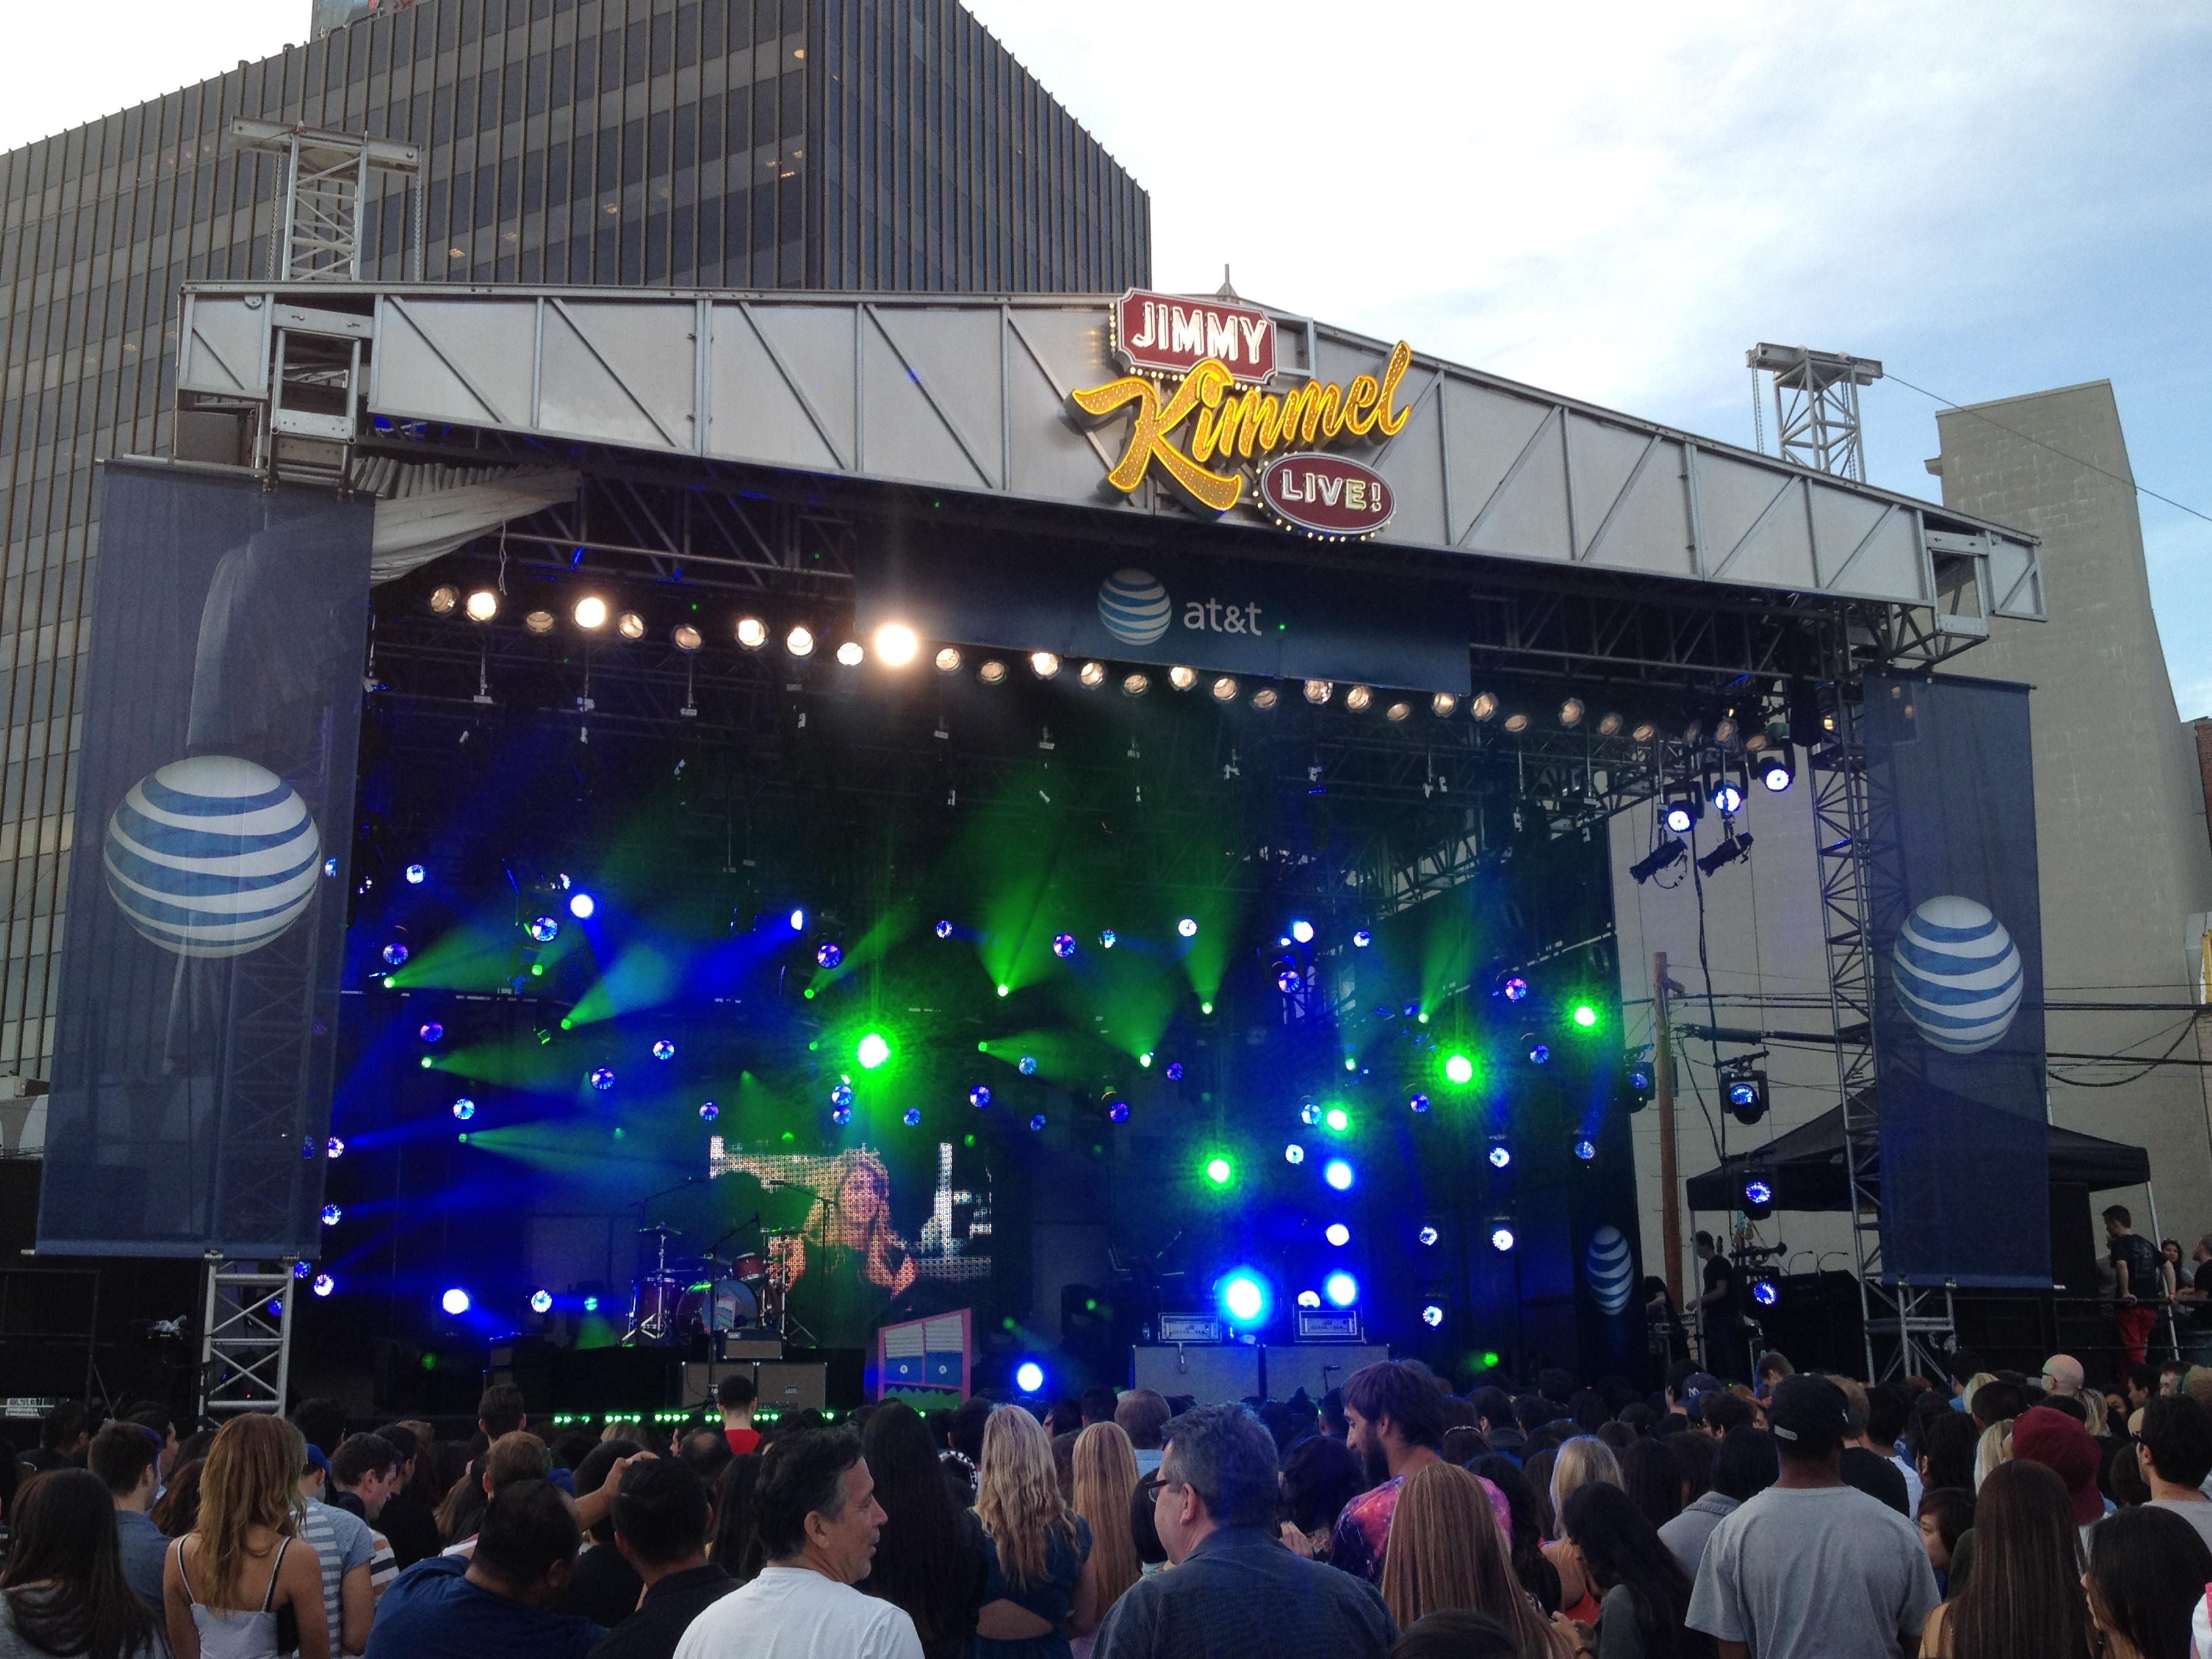 Jimmy Kimmel outdoor concert